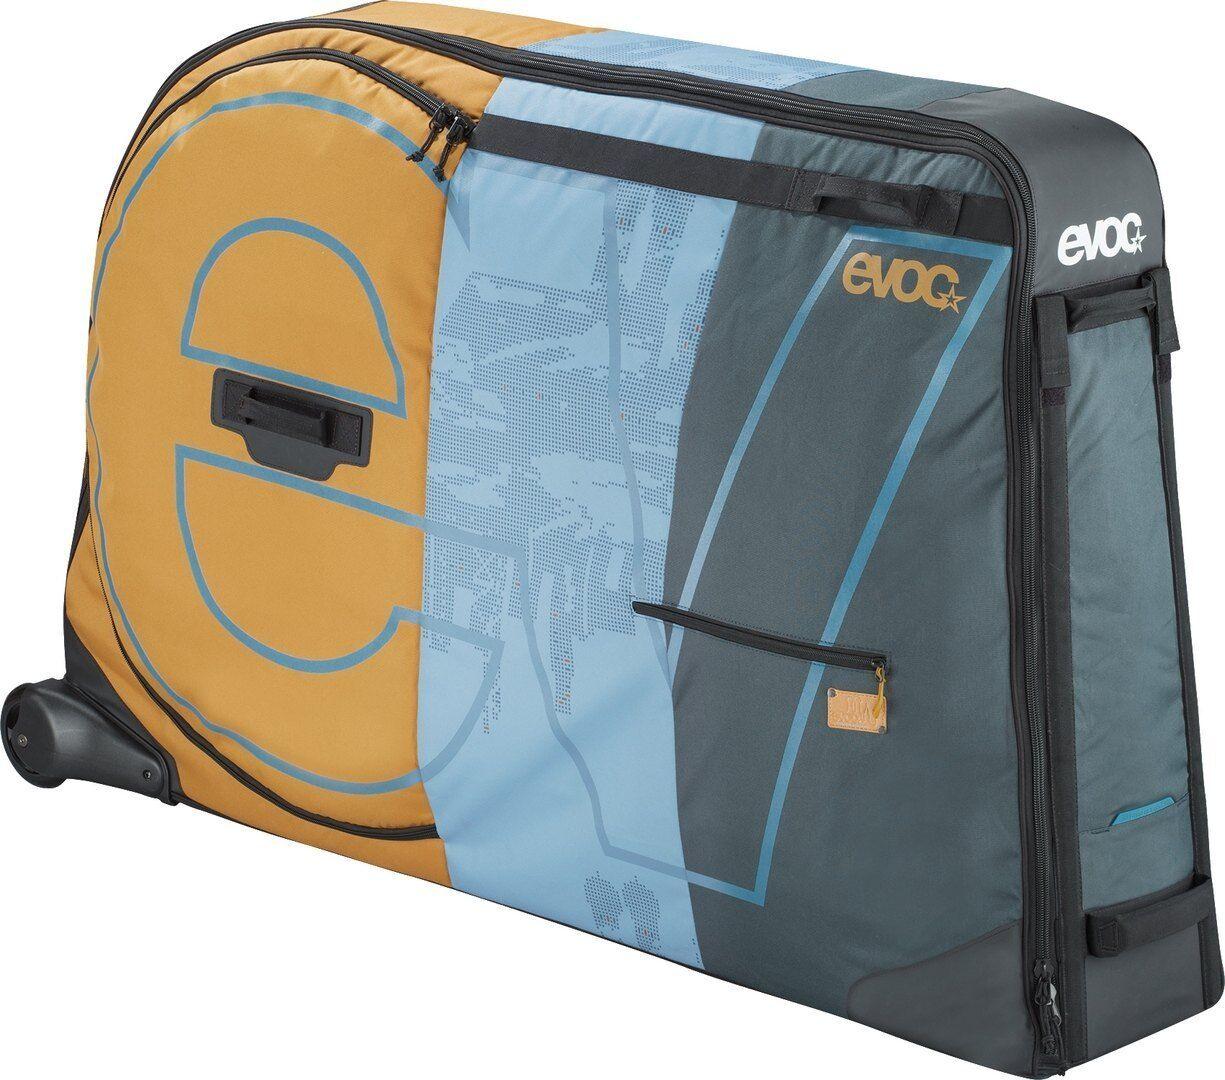 Evoc Bike Travel Bag 285L  - Multicolored - Size: One Size